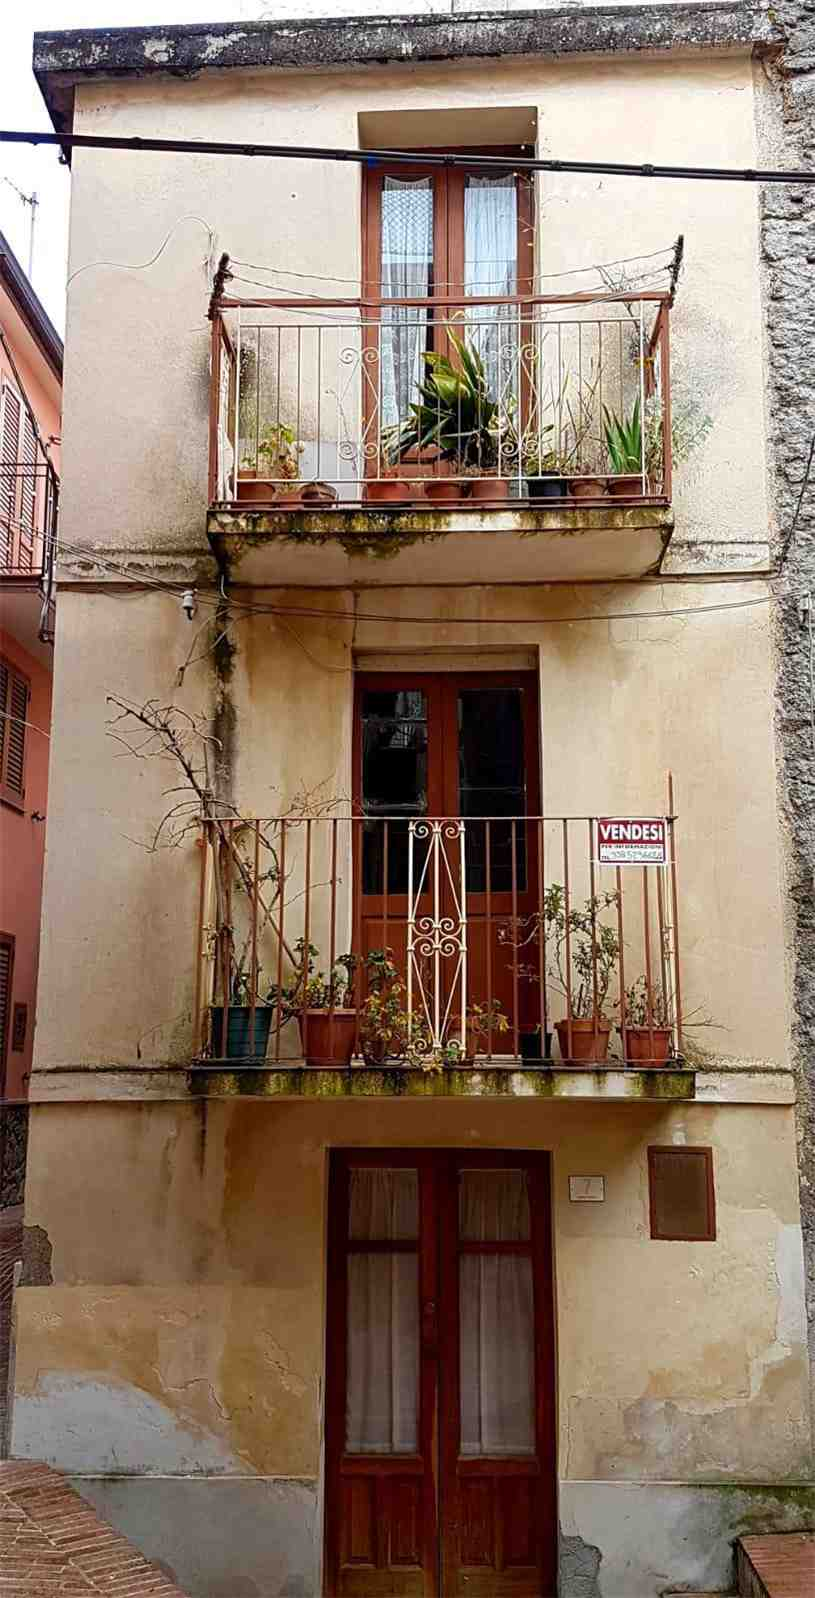 For sale Detached house San Salvatore di Fitalia  #32FC n.6